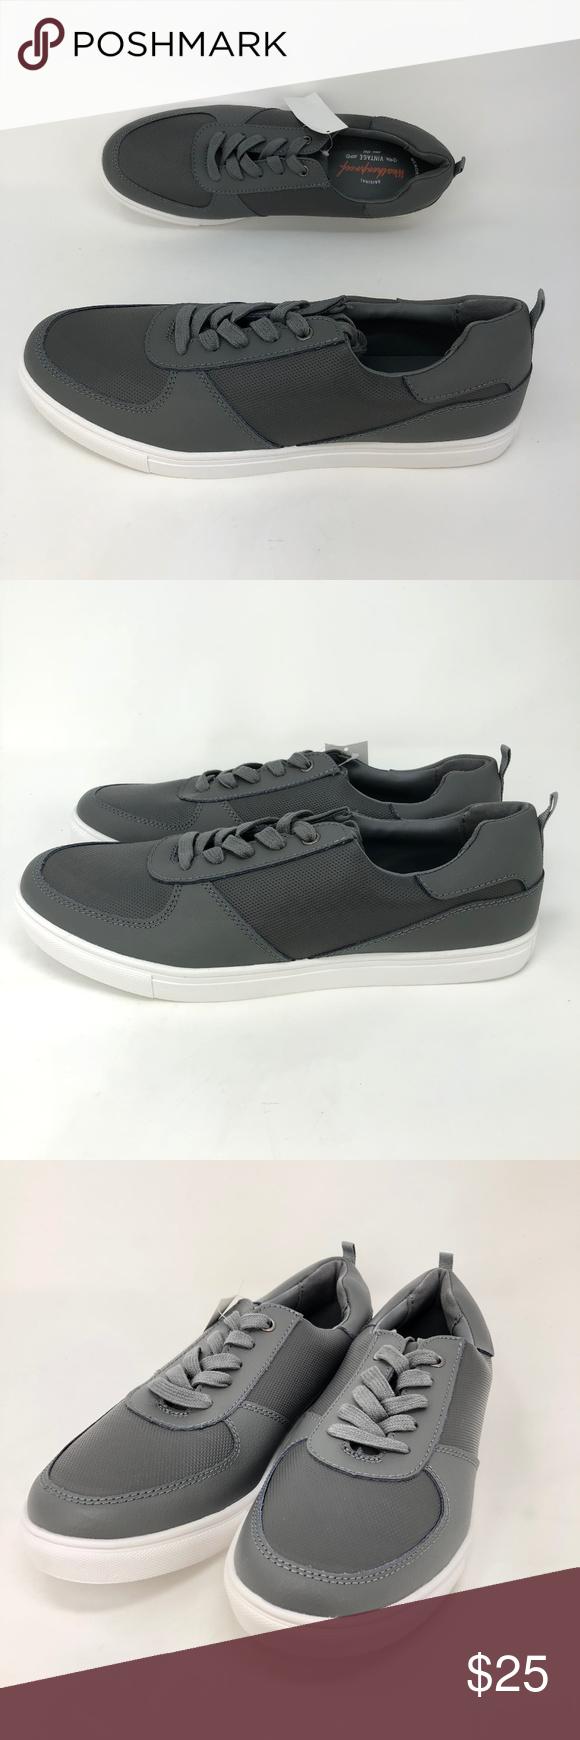 Ethan Memory Foam Shoes innovatis-suisse.ch